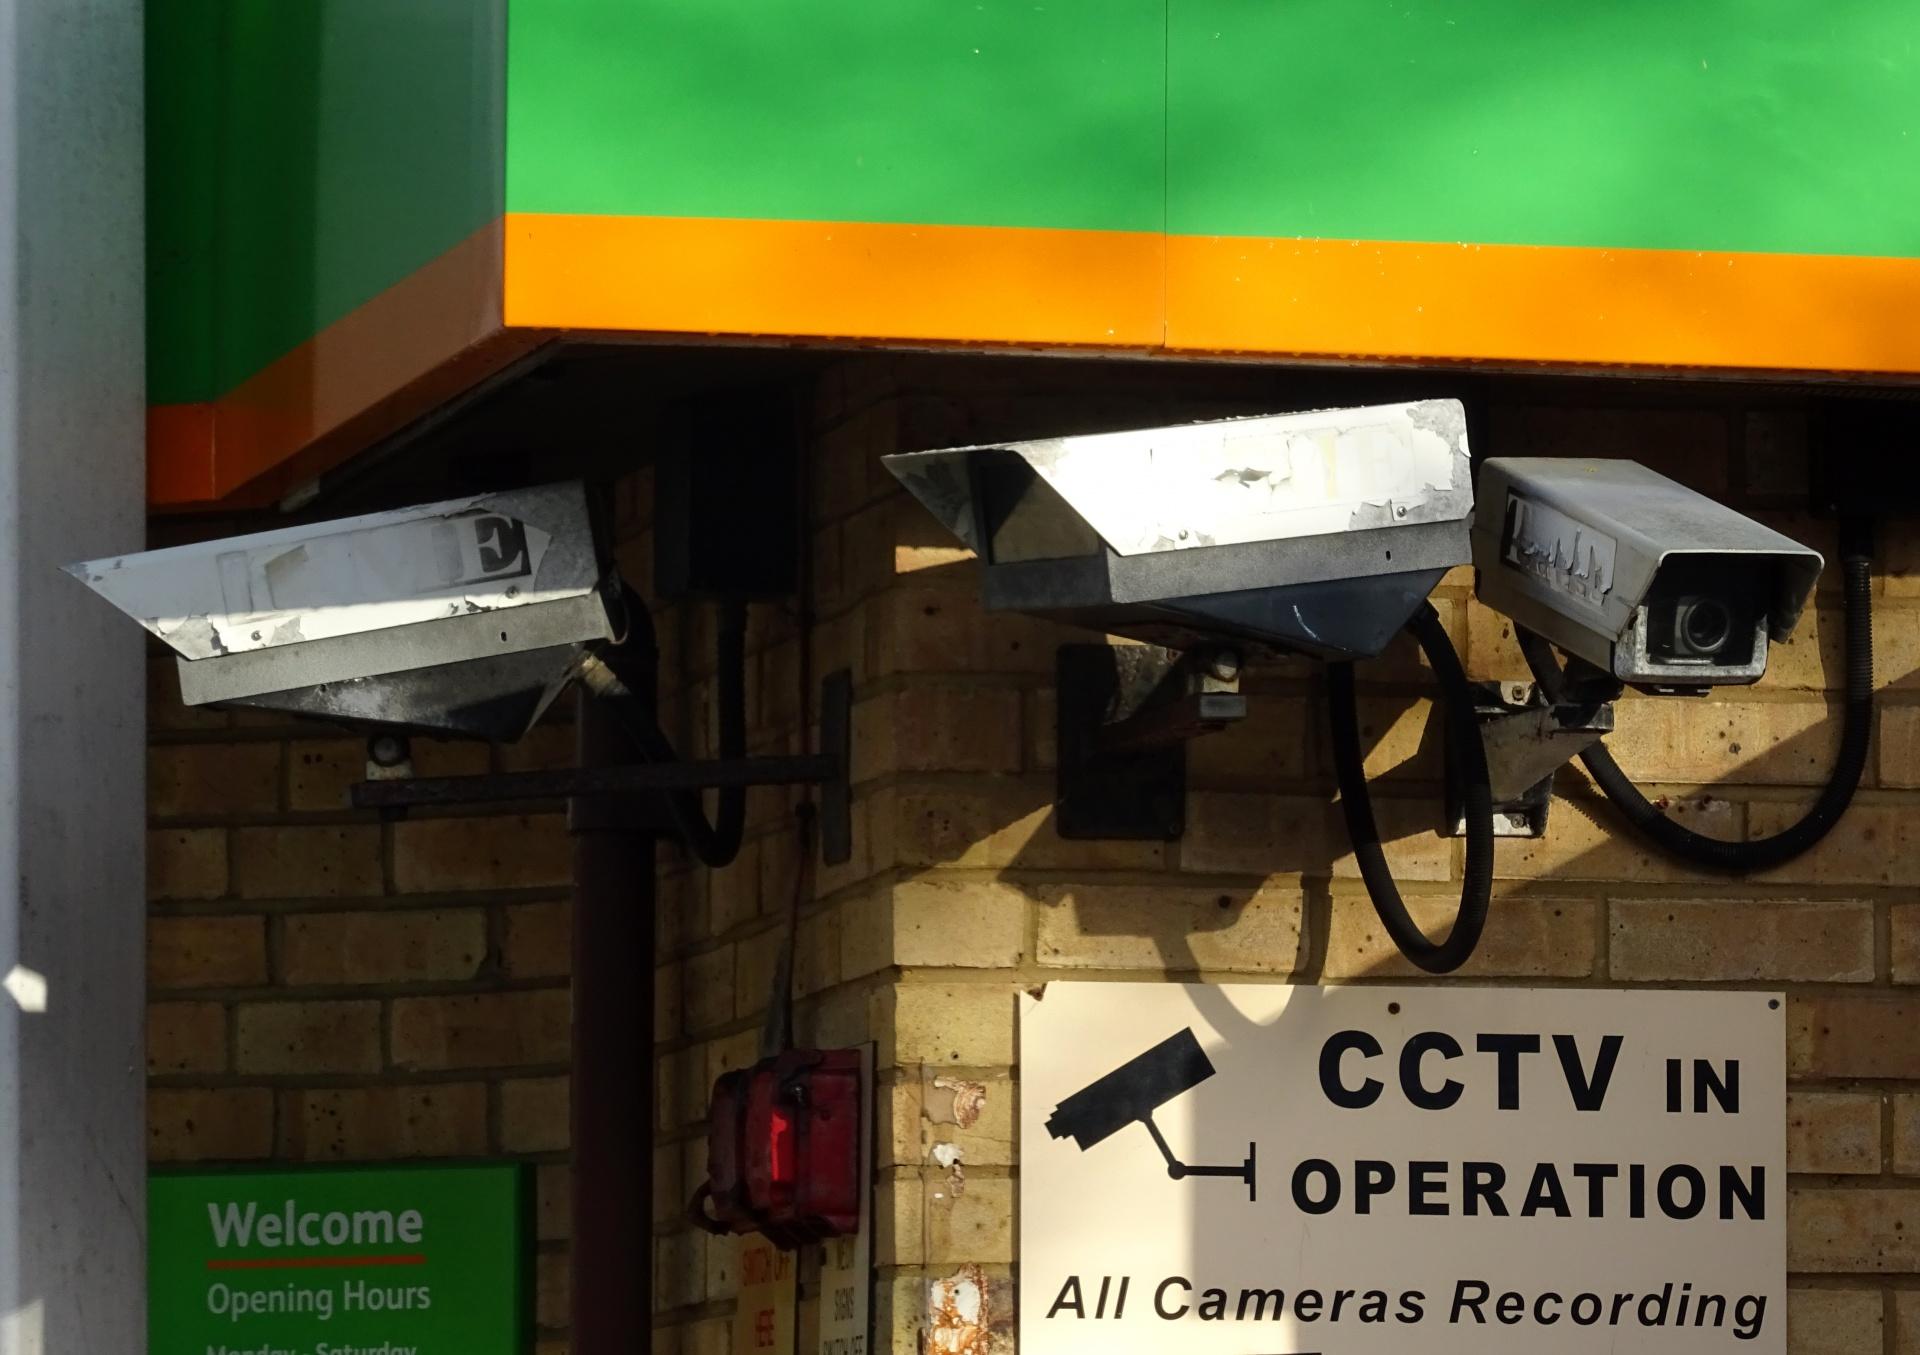 Surveillance van clipart clipart free Cctv,surveillance,van,vans,fbi - free photo from needpix.com clipart free